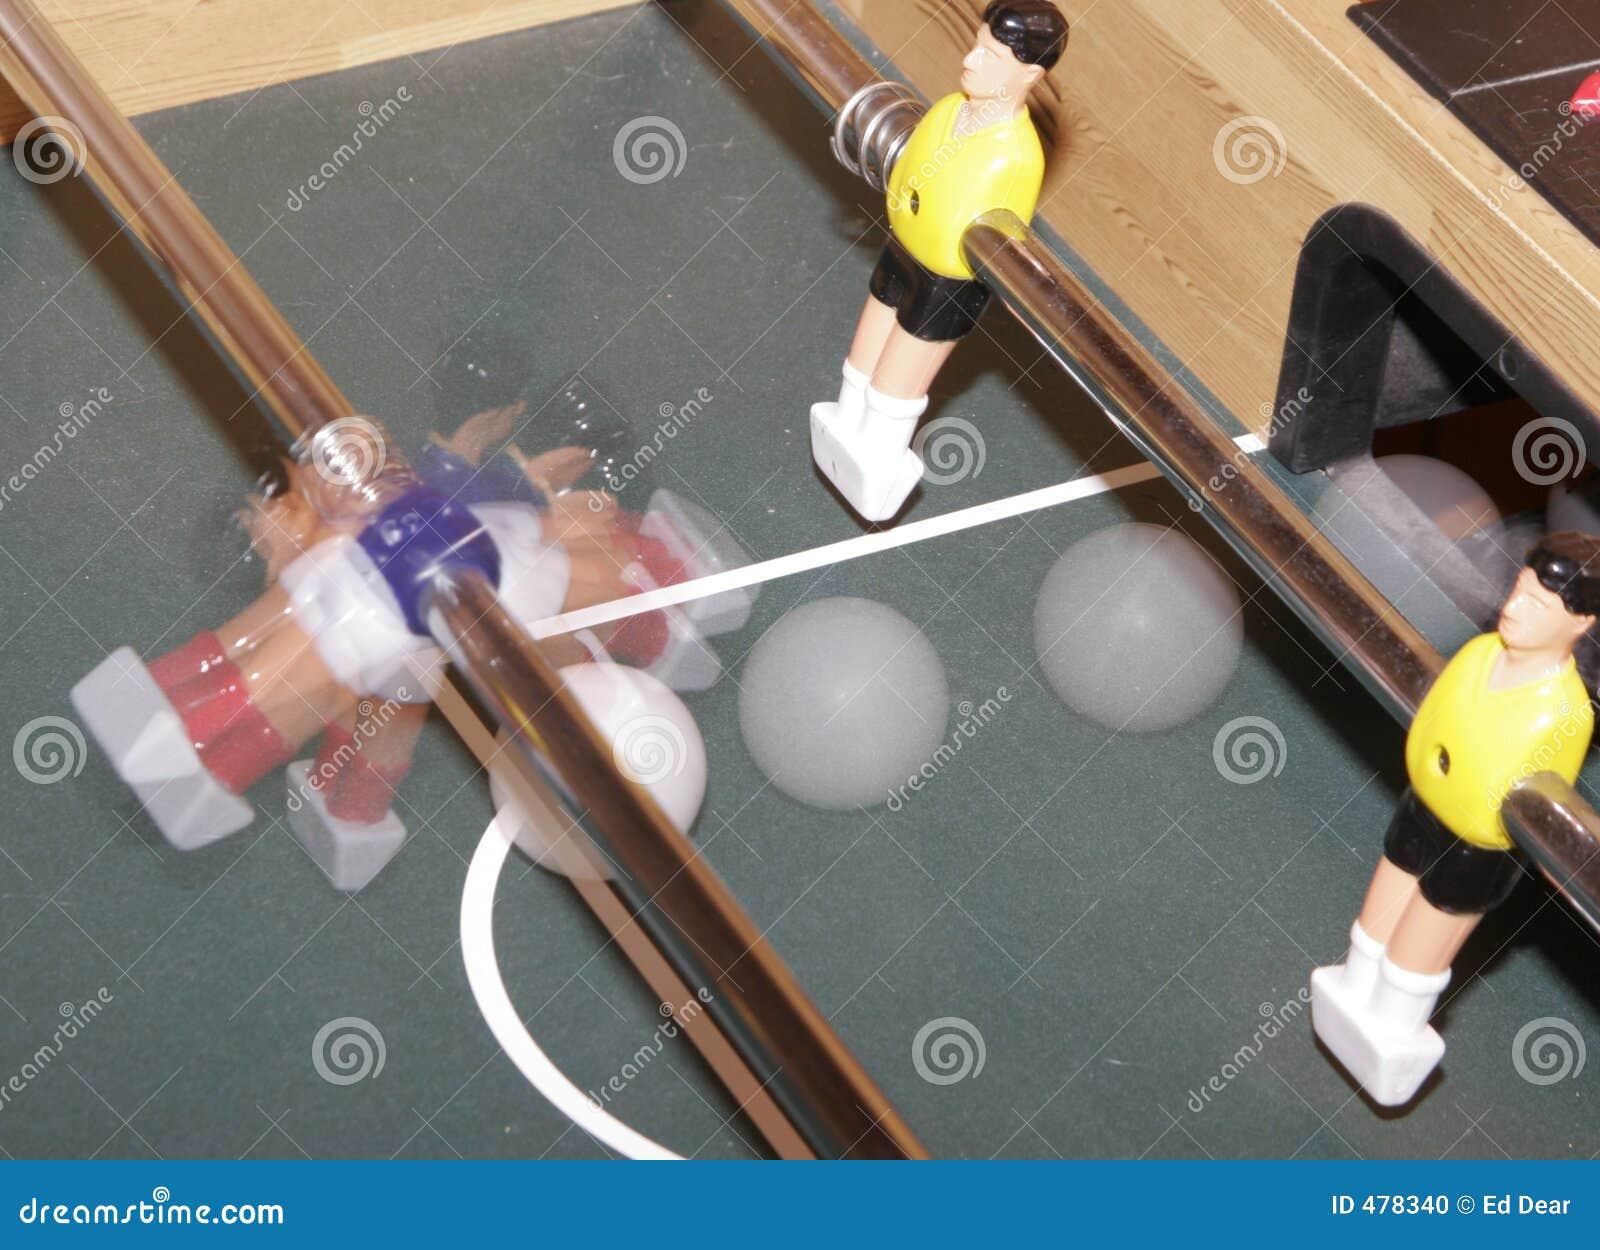 Le football de dessus de Tableau